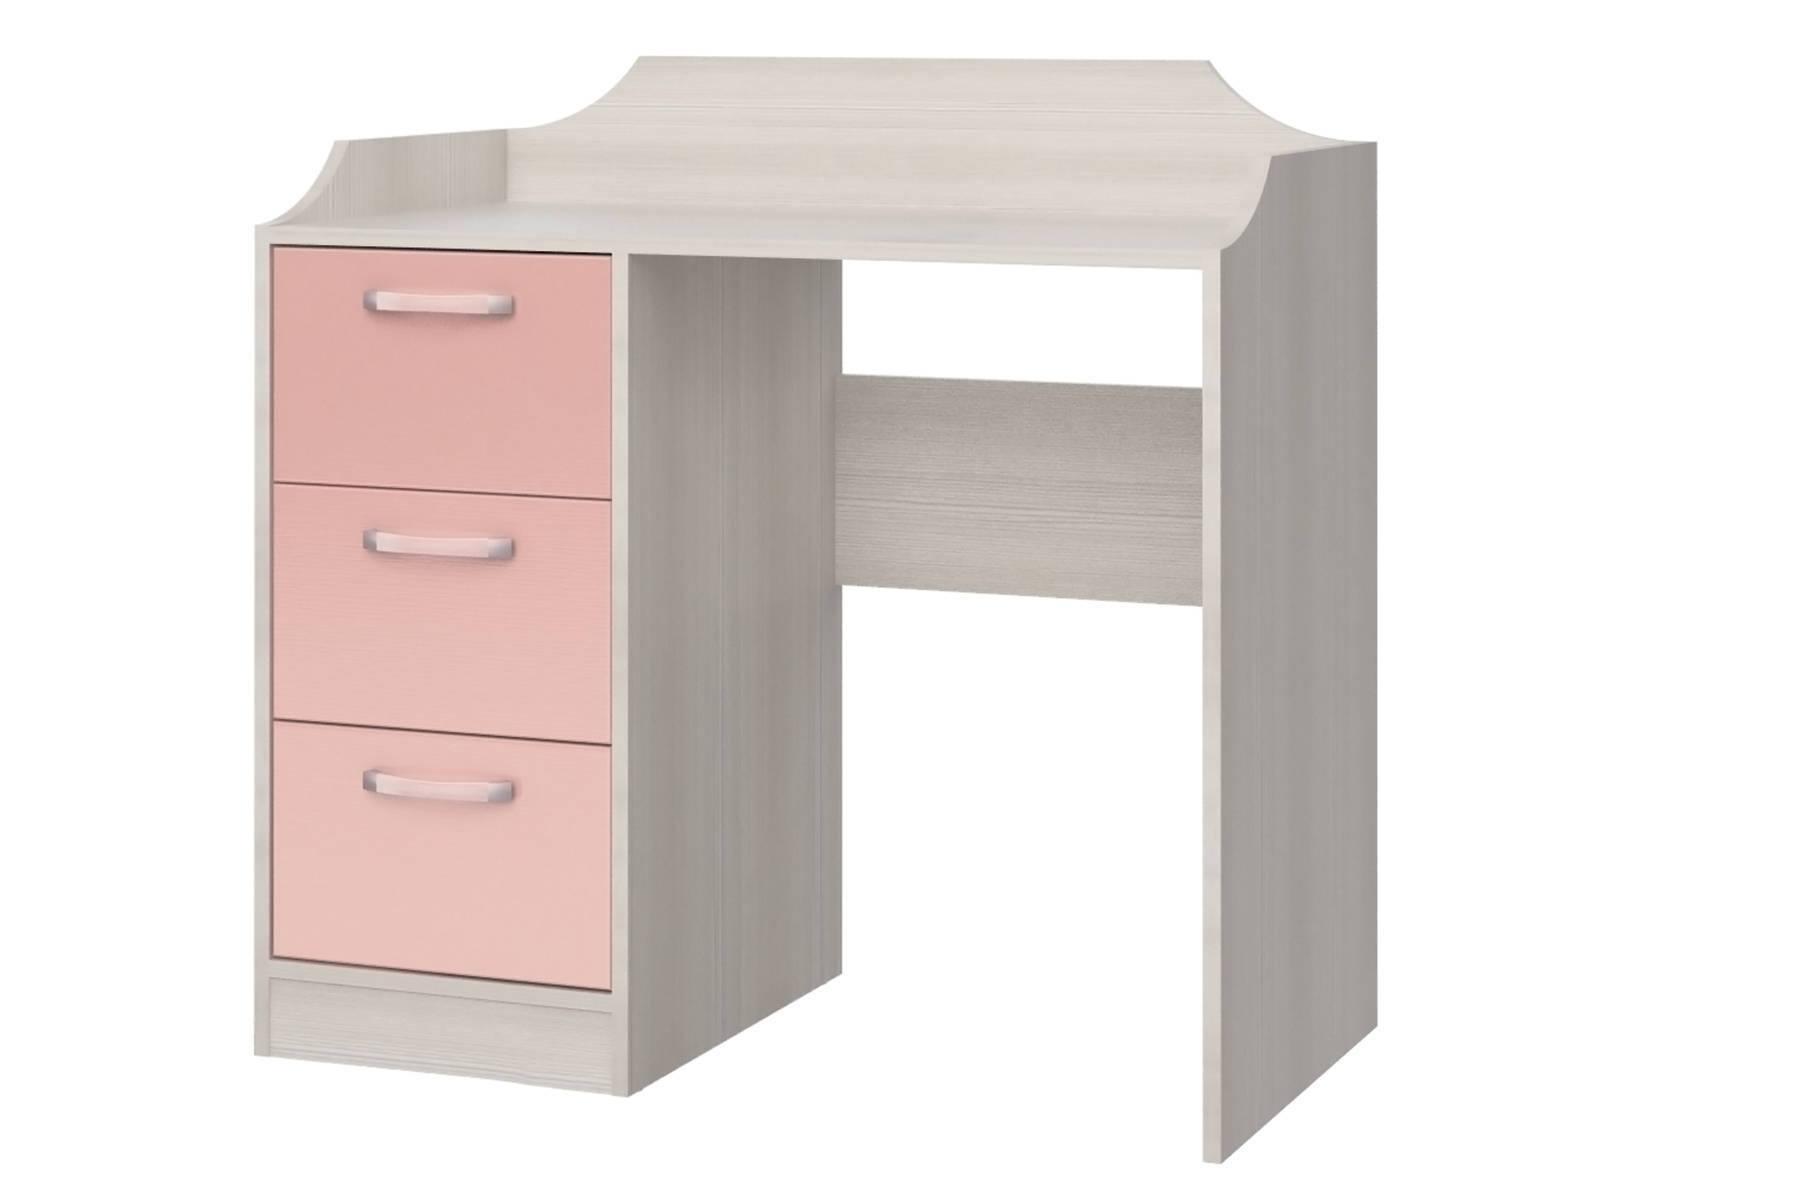 Стол компьютерный Флауэ Розовый СТЛ.093.21